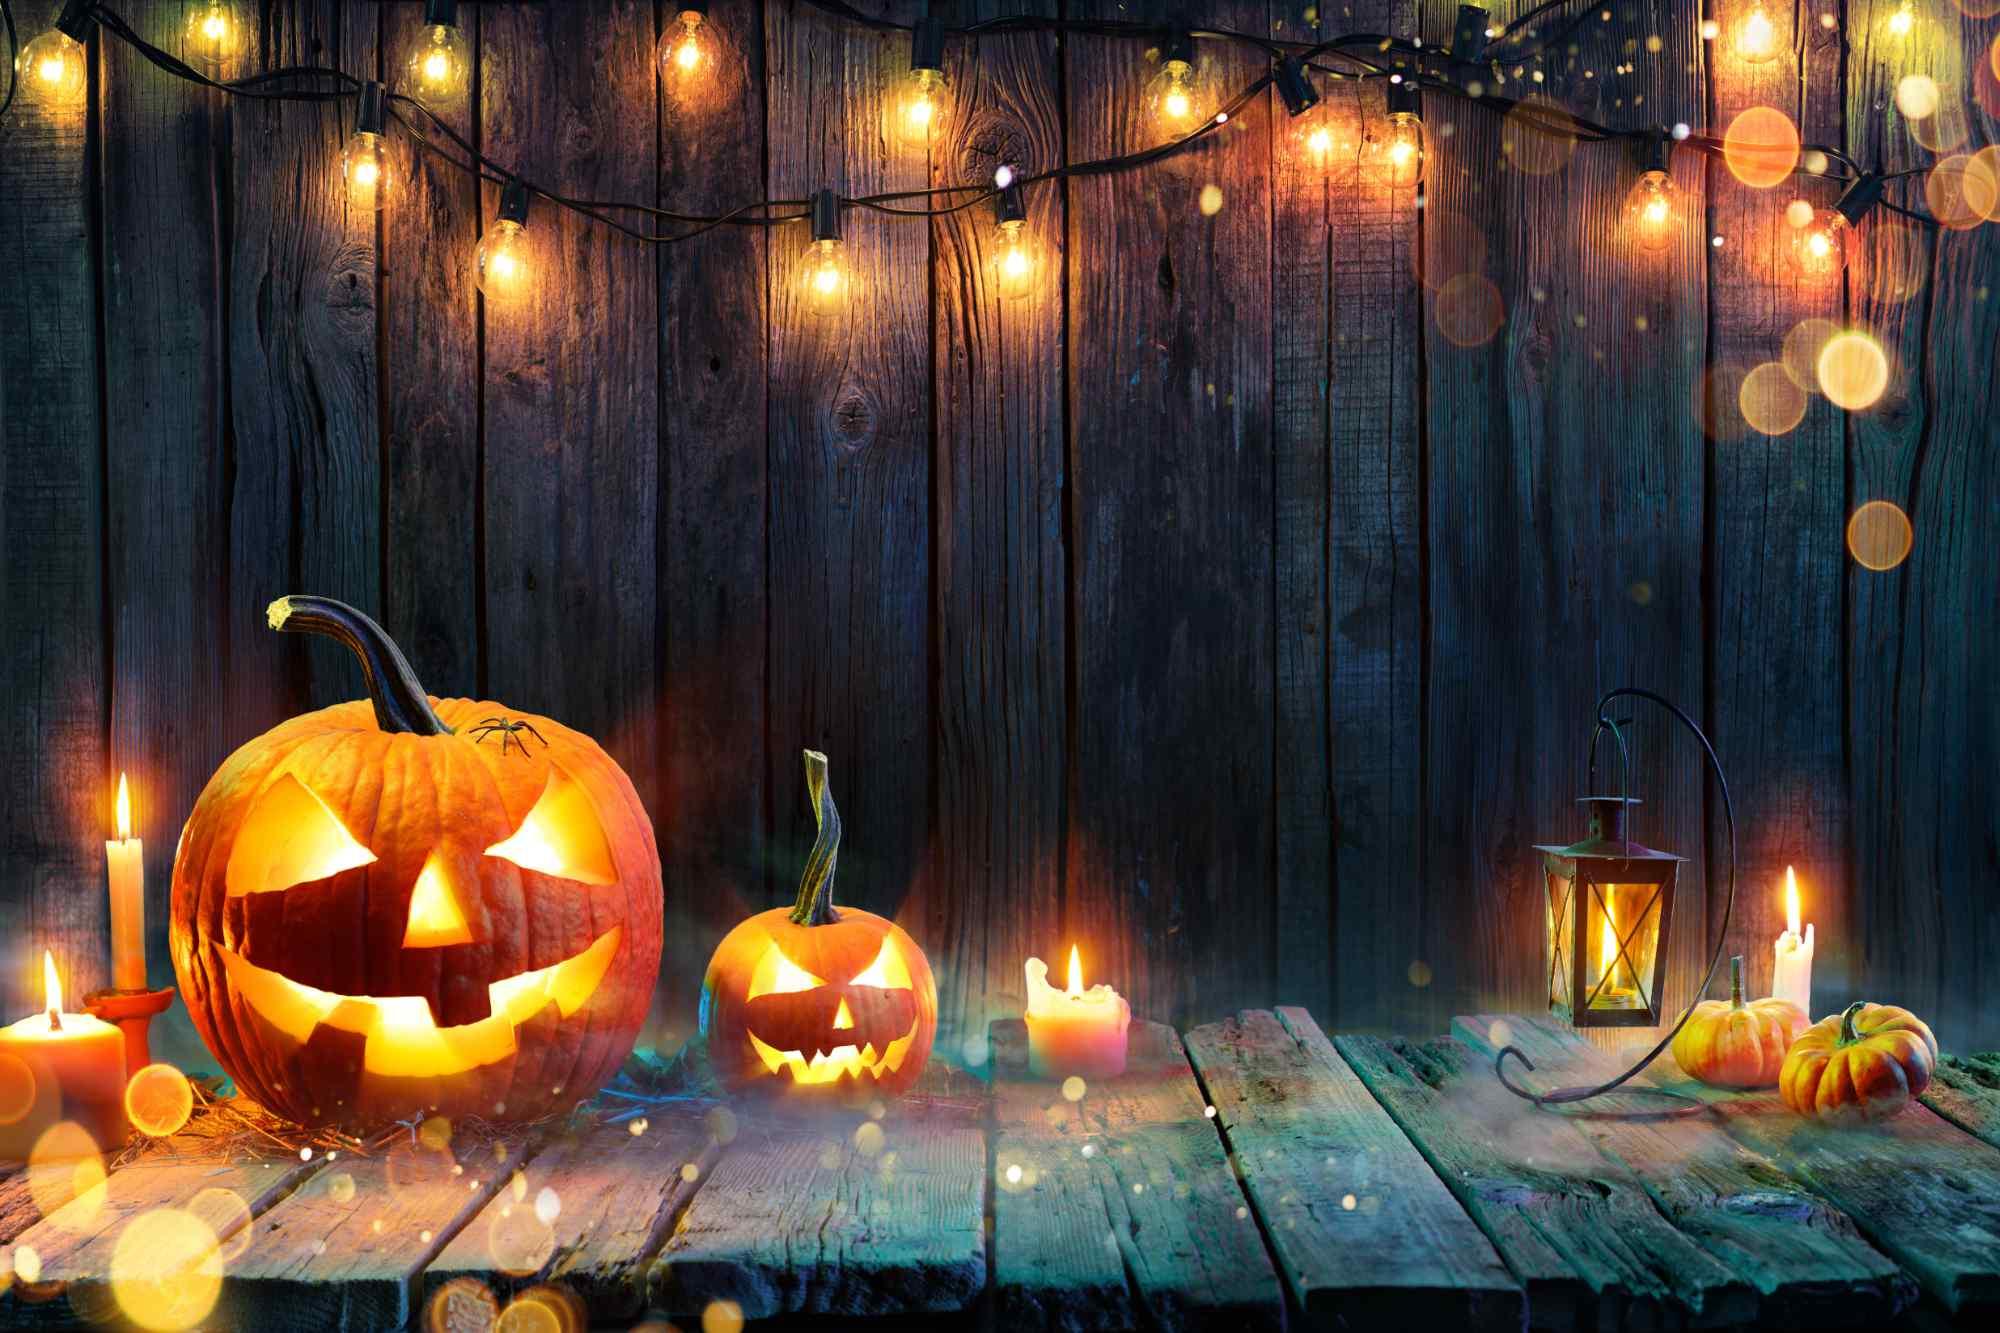 Pumpkins with fairy lights Halloween background